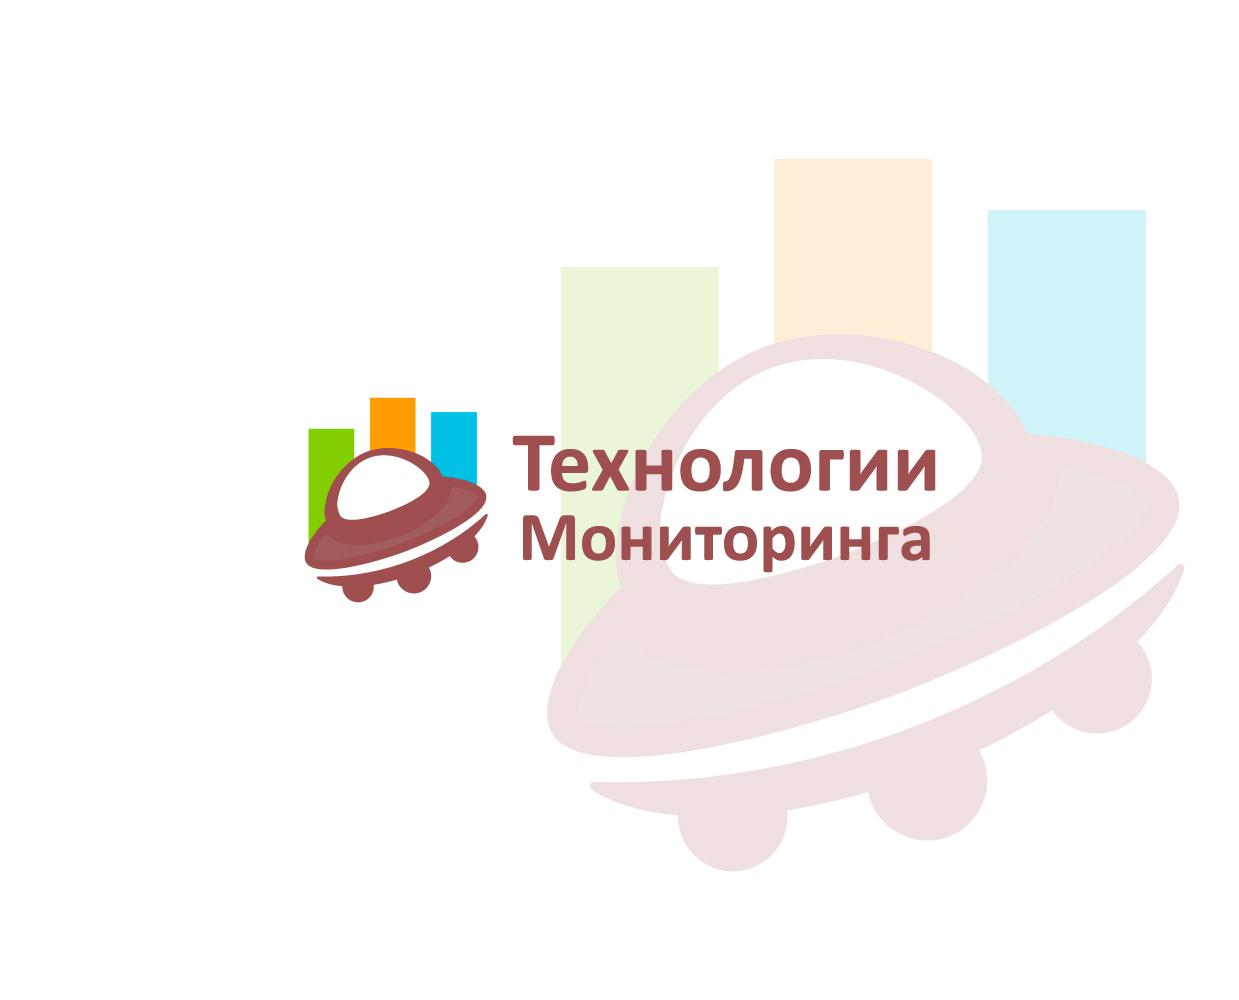 Разработка логотипа фото f_3785977fcdd506a7.jpg